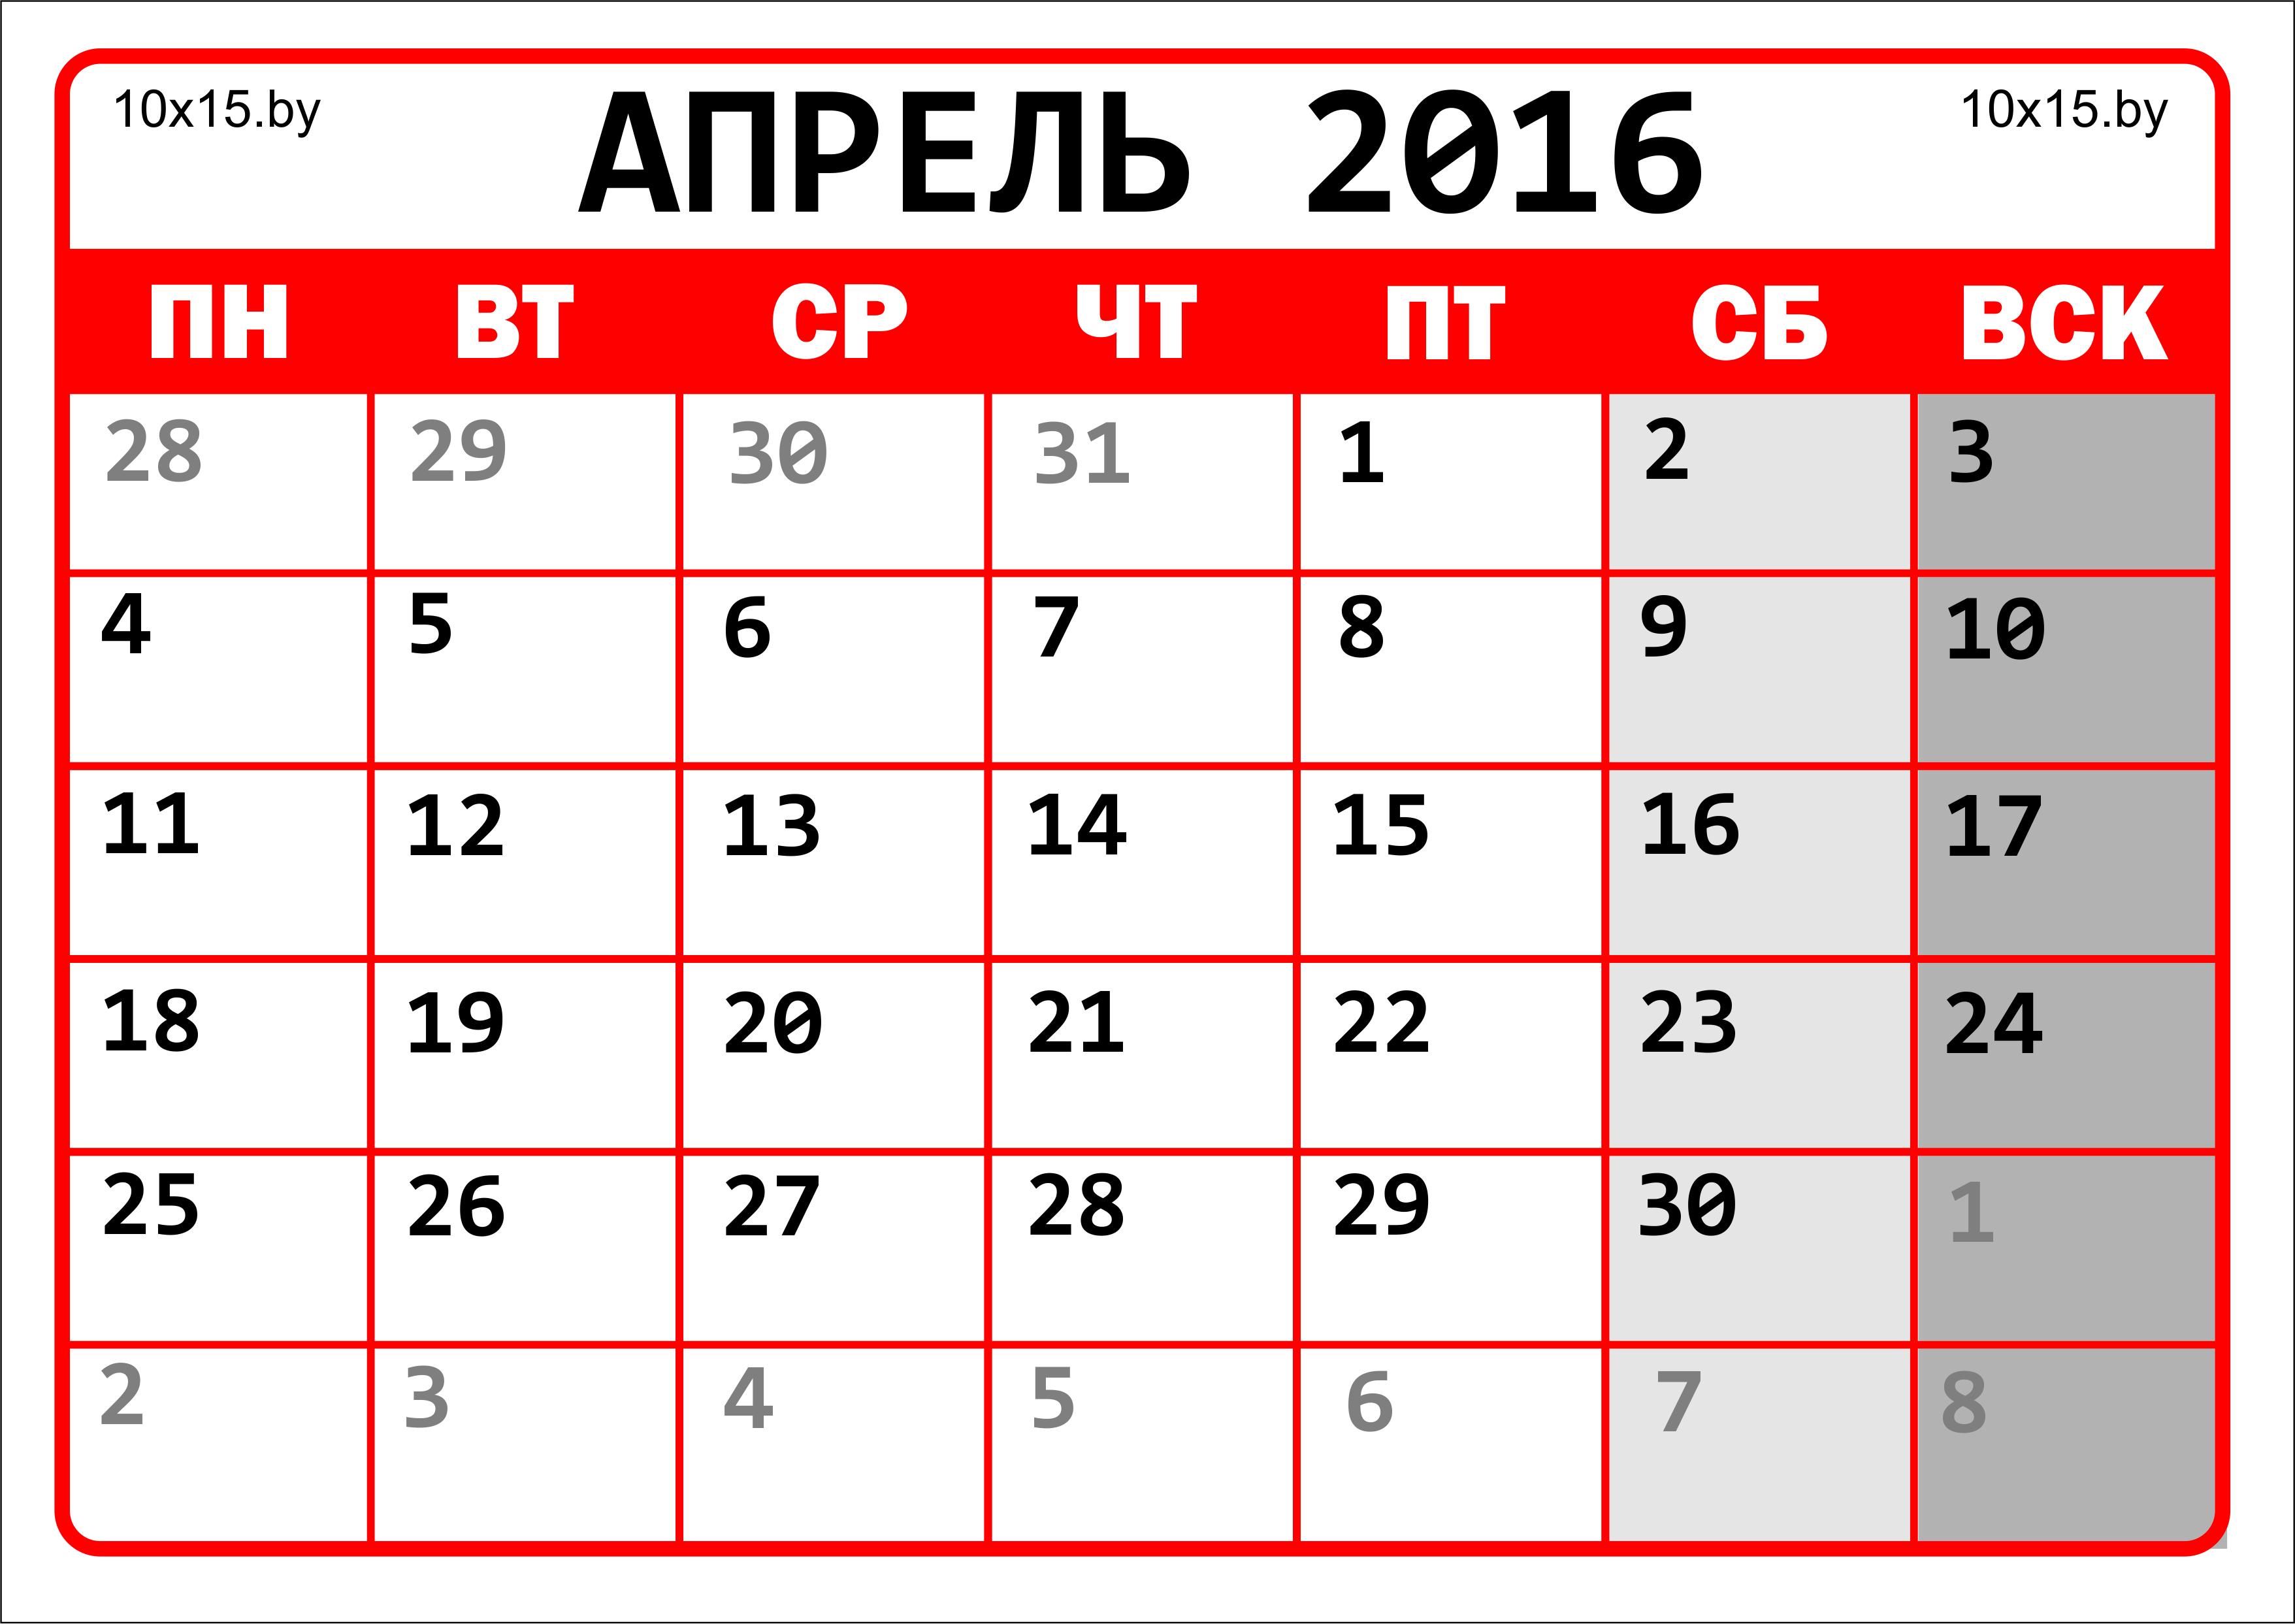 Календарь 3 на 3 дня